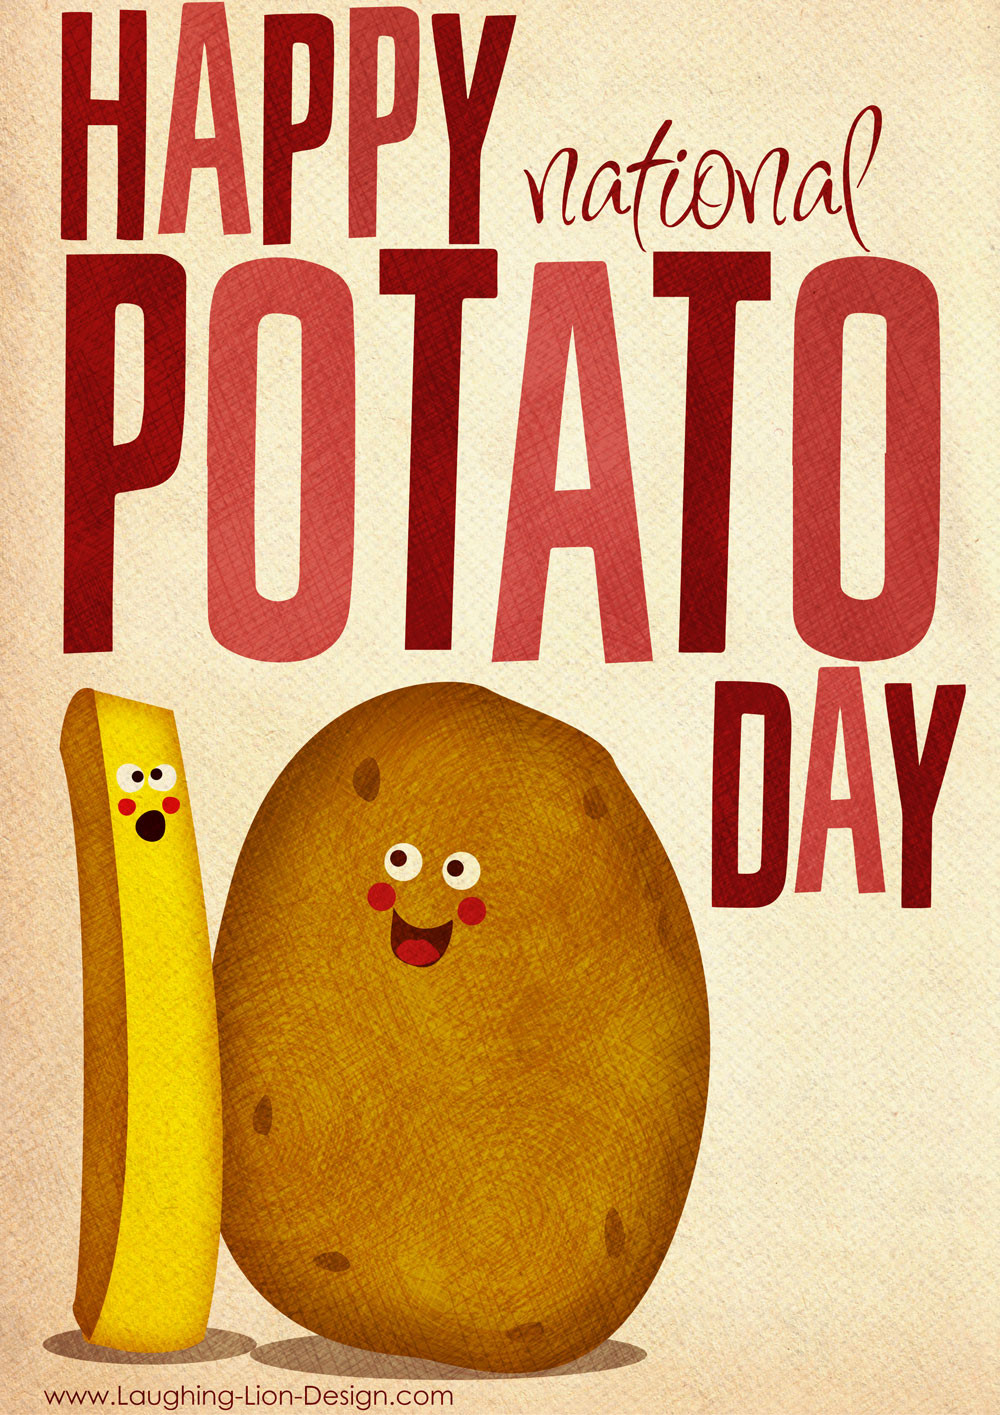 National Potato Day  Happy National Potato Day or Is It Potato Chip World